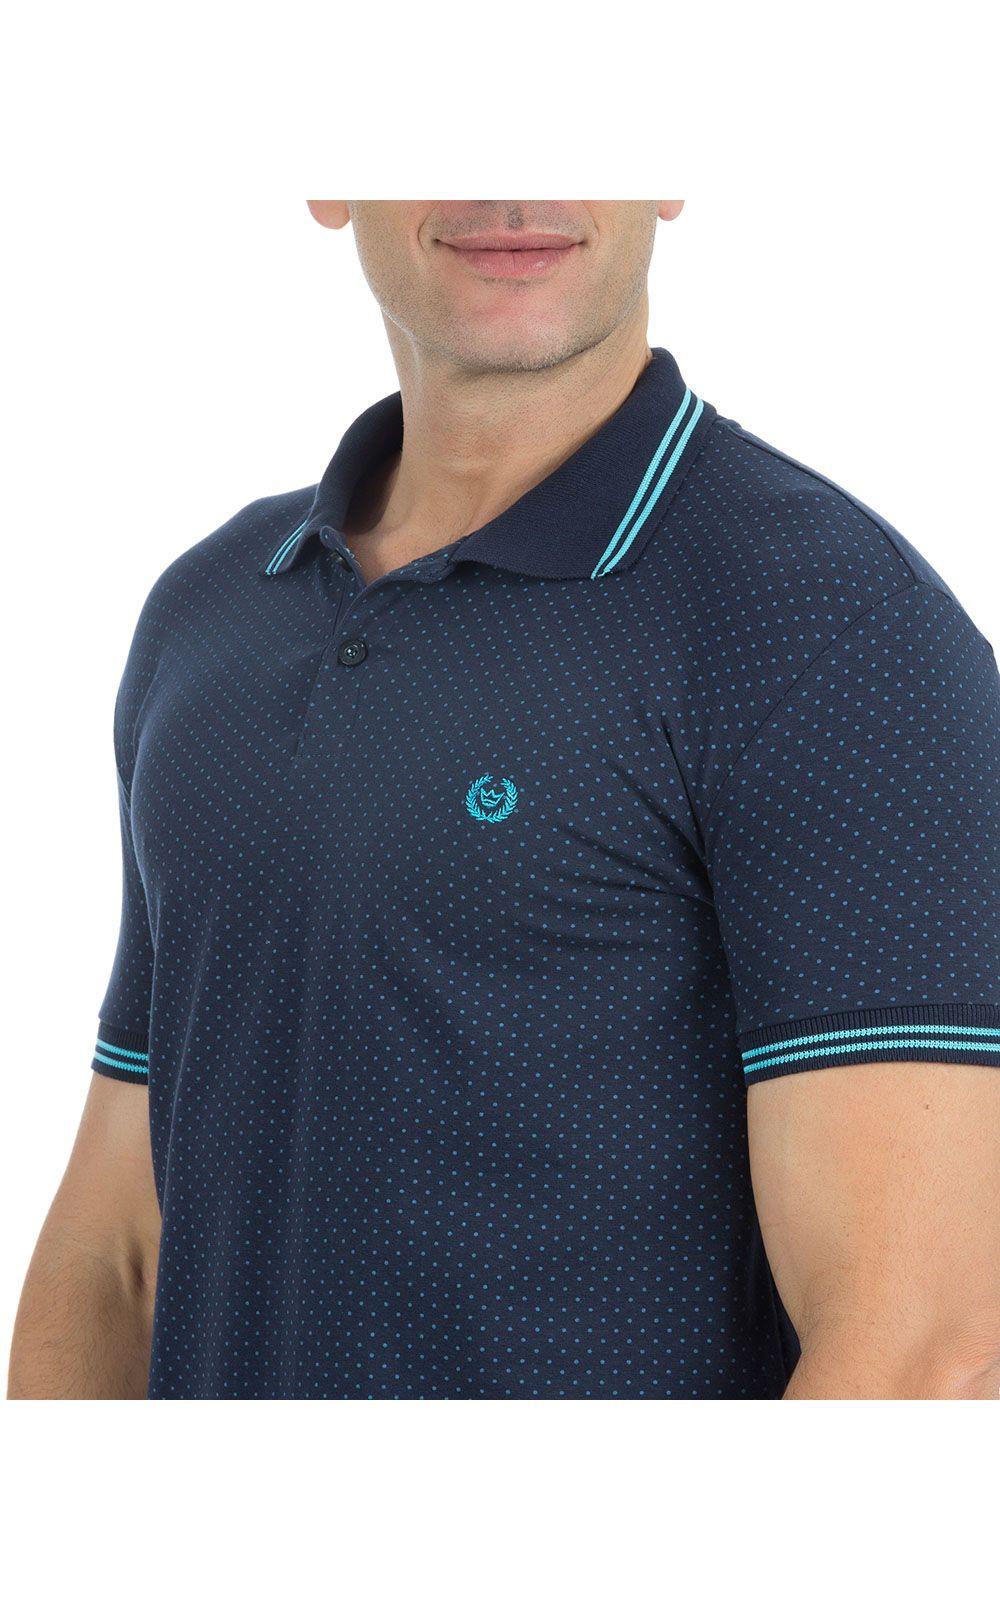 Foto 3 - Camisa Polo Masculina Azul Estampada